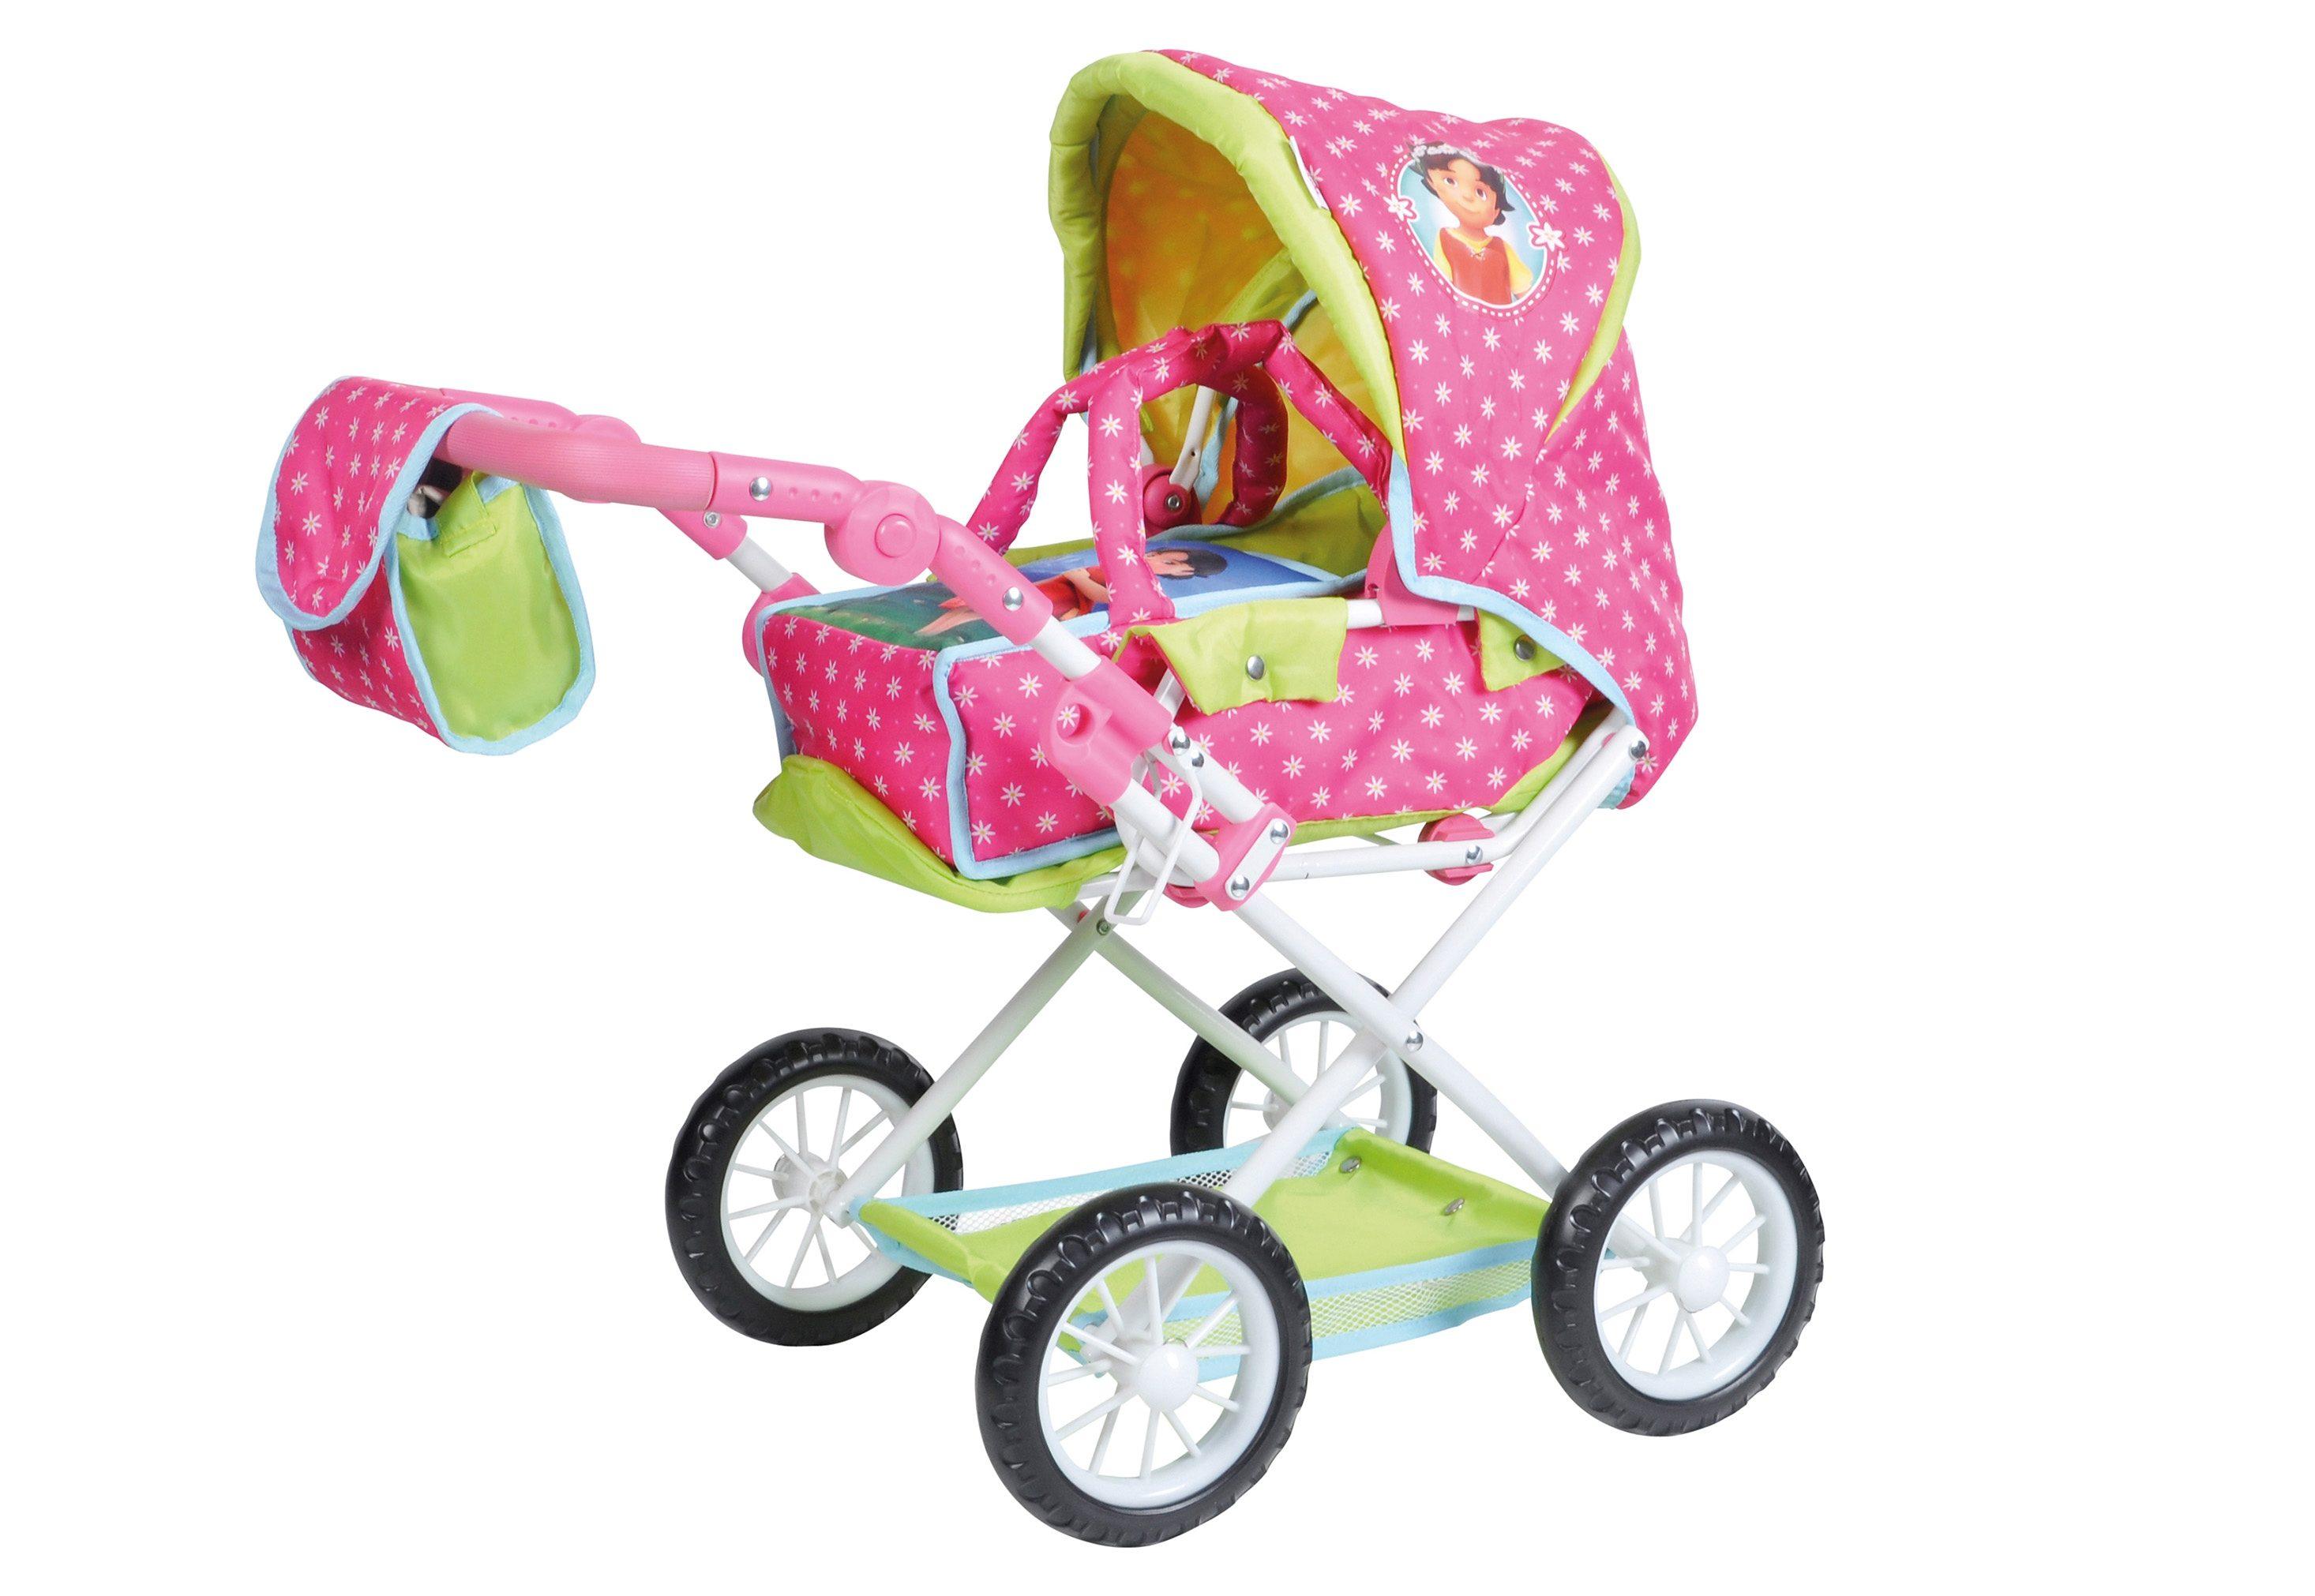 Kombi-Puppenwagen, »Heidi-Ruby«, knorr toys